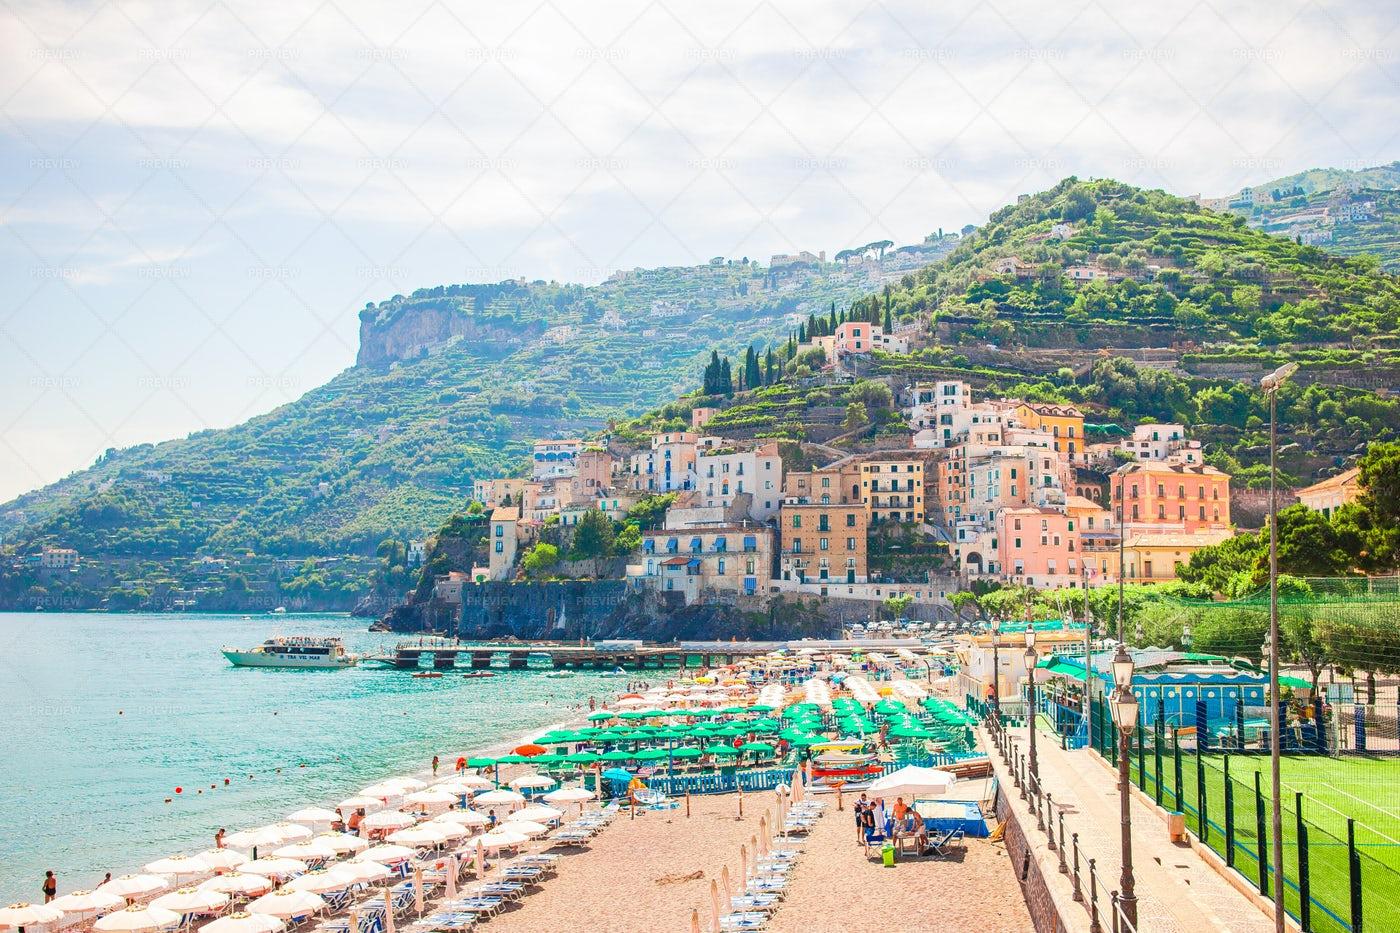 Beaches On The Amalfi Coast: Stock Photos